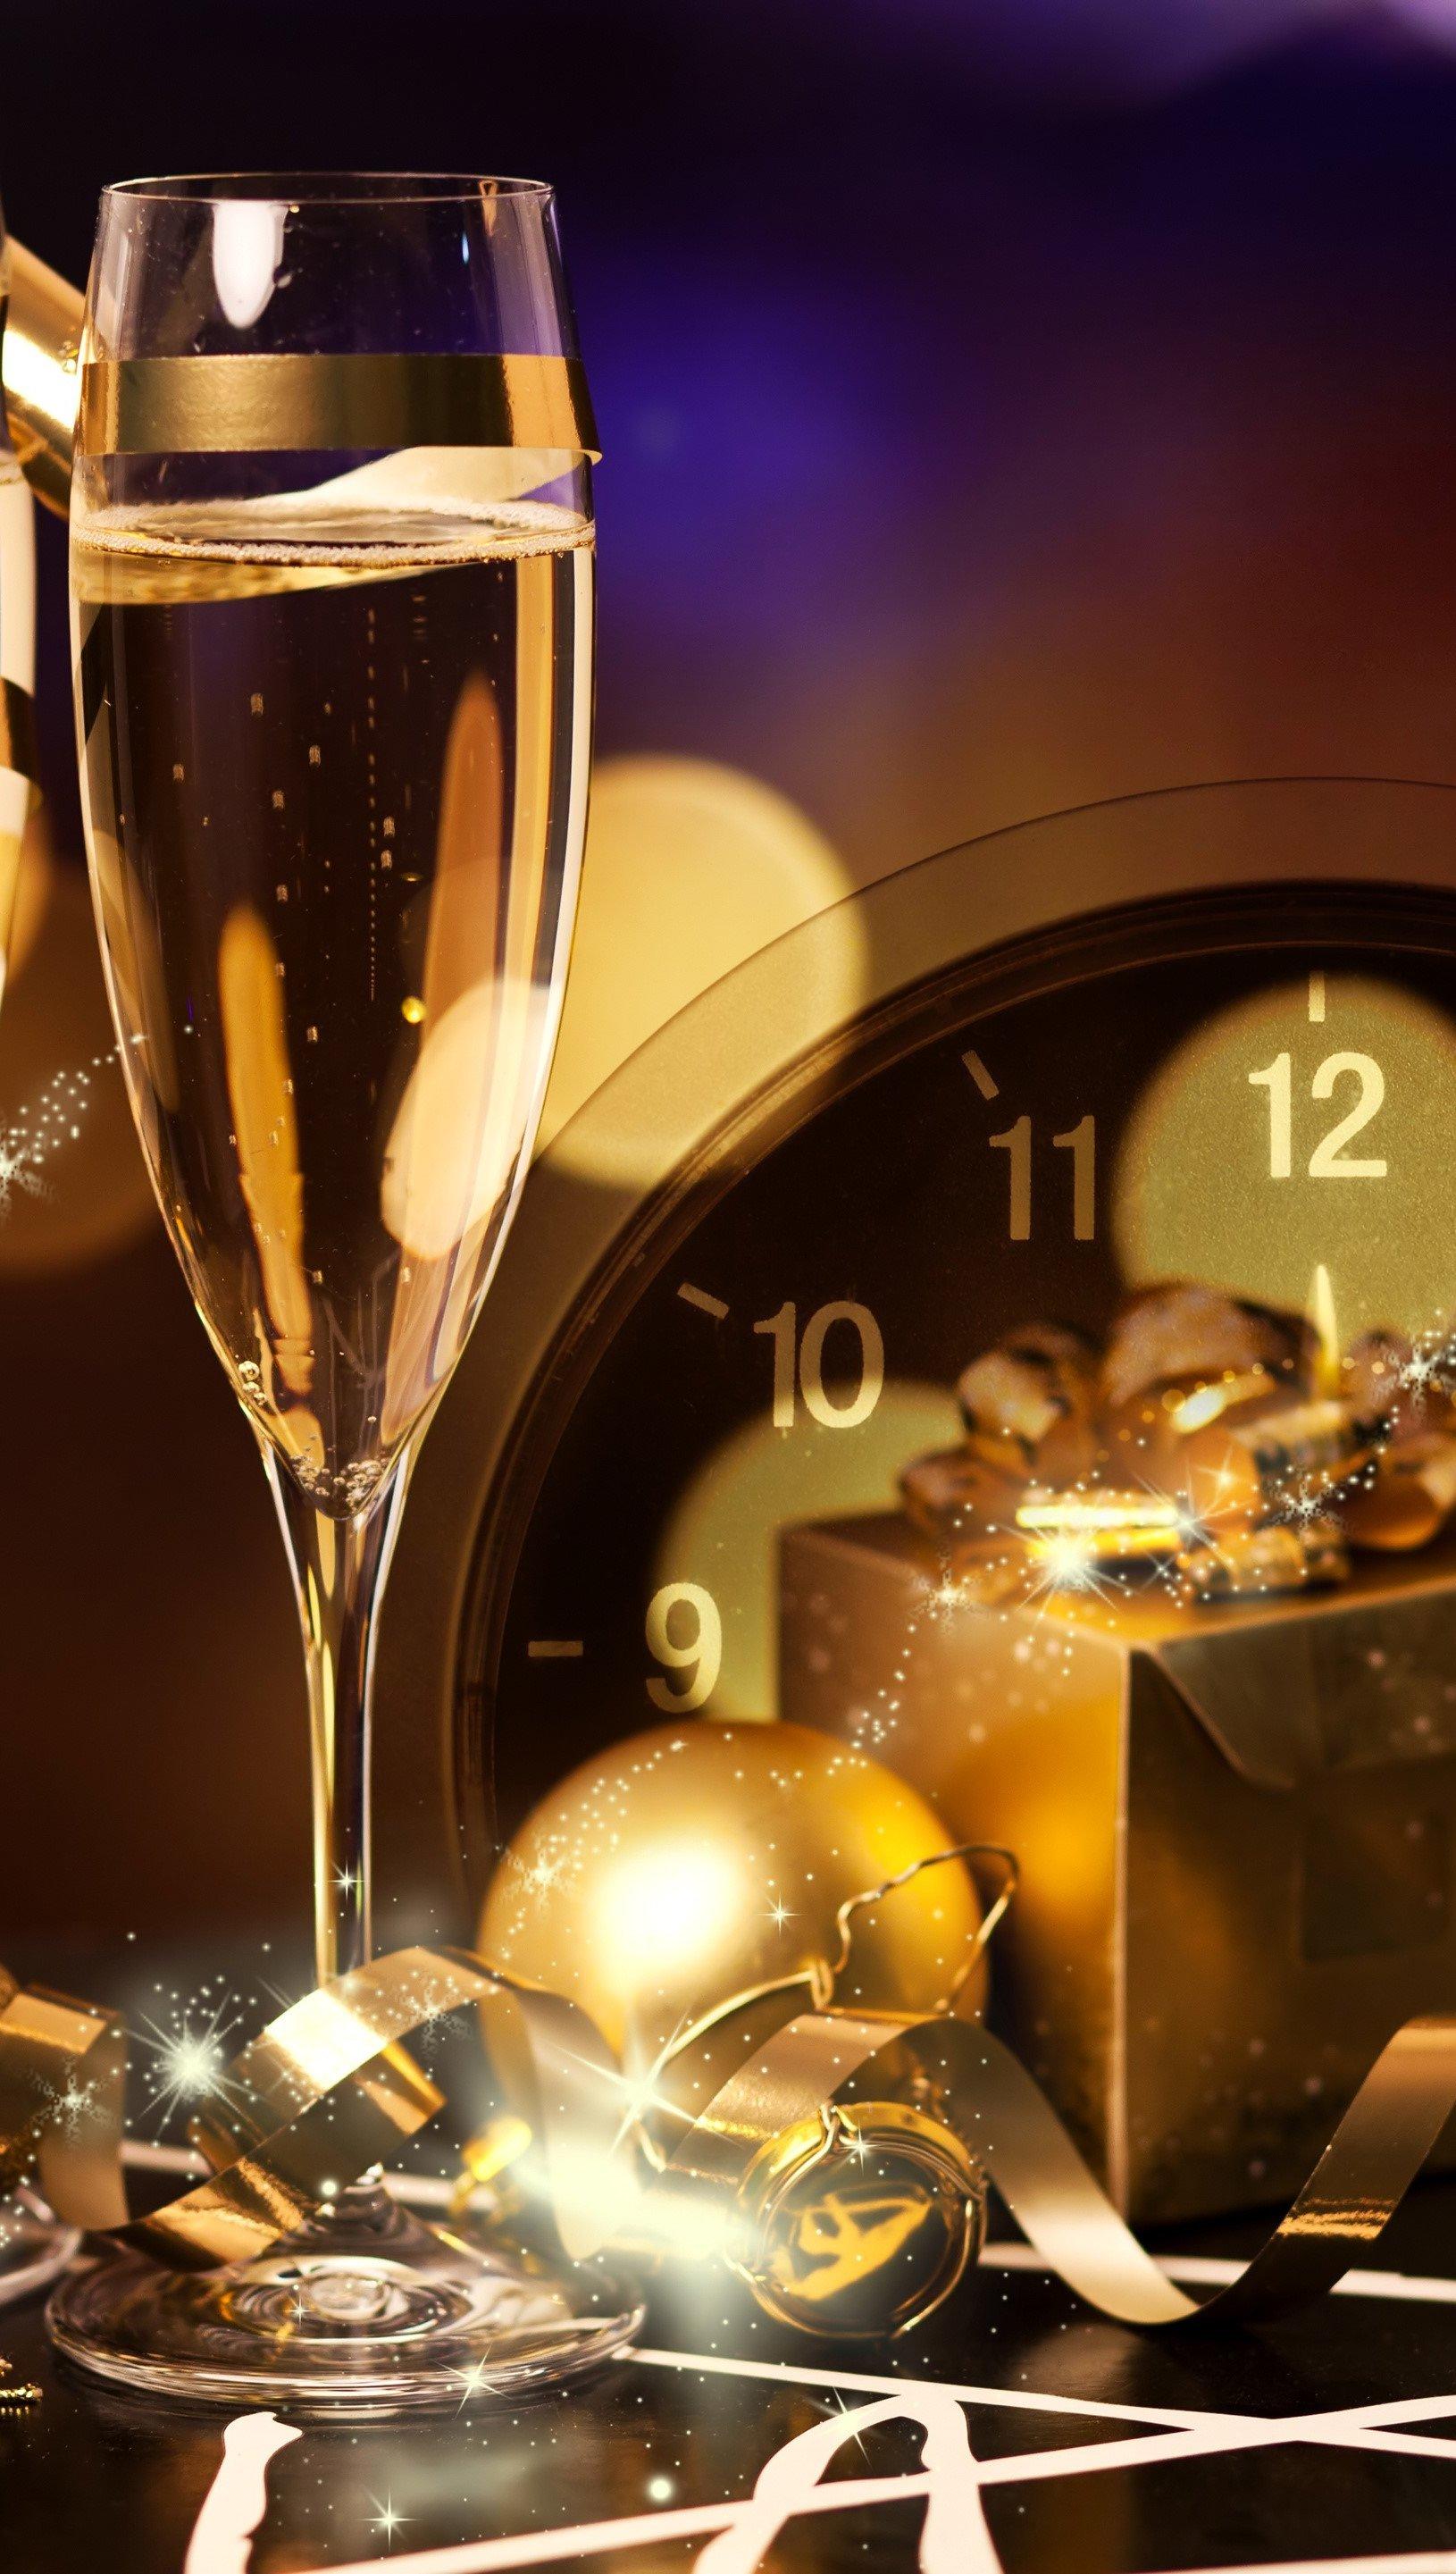 Wallpaper New Year's celebration Vertical